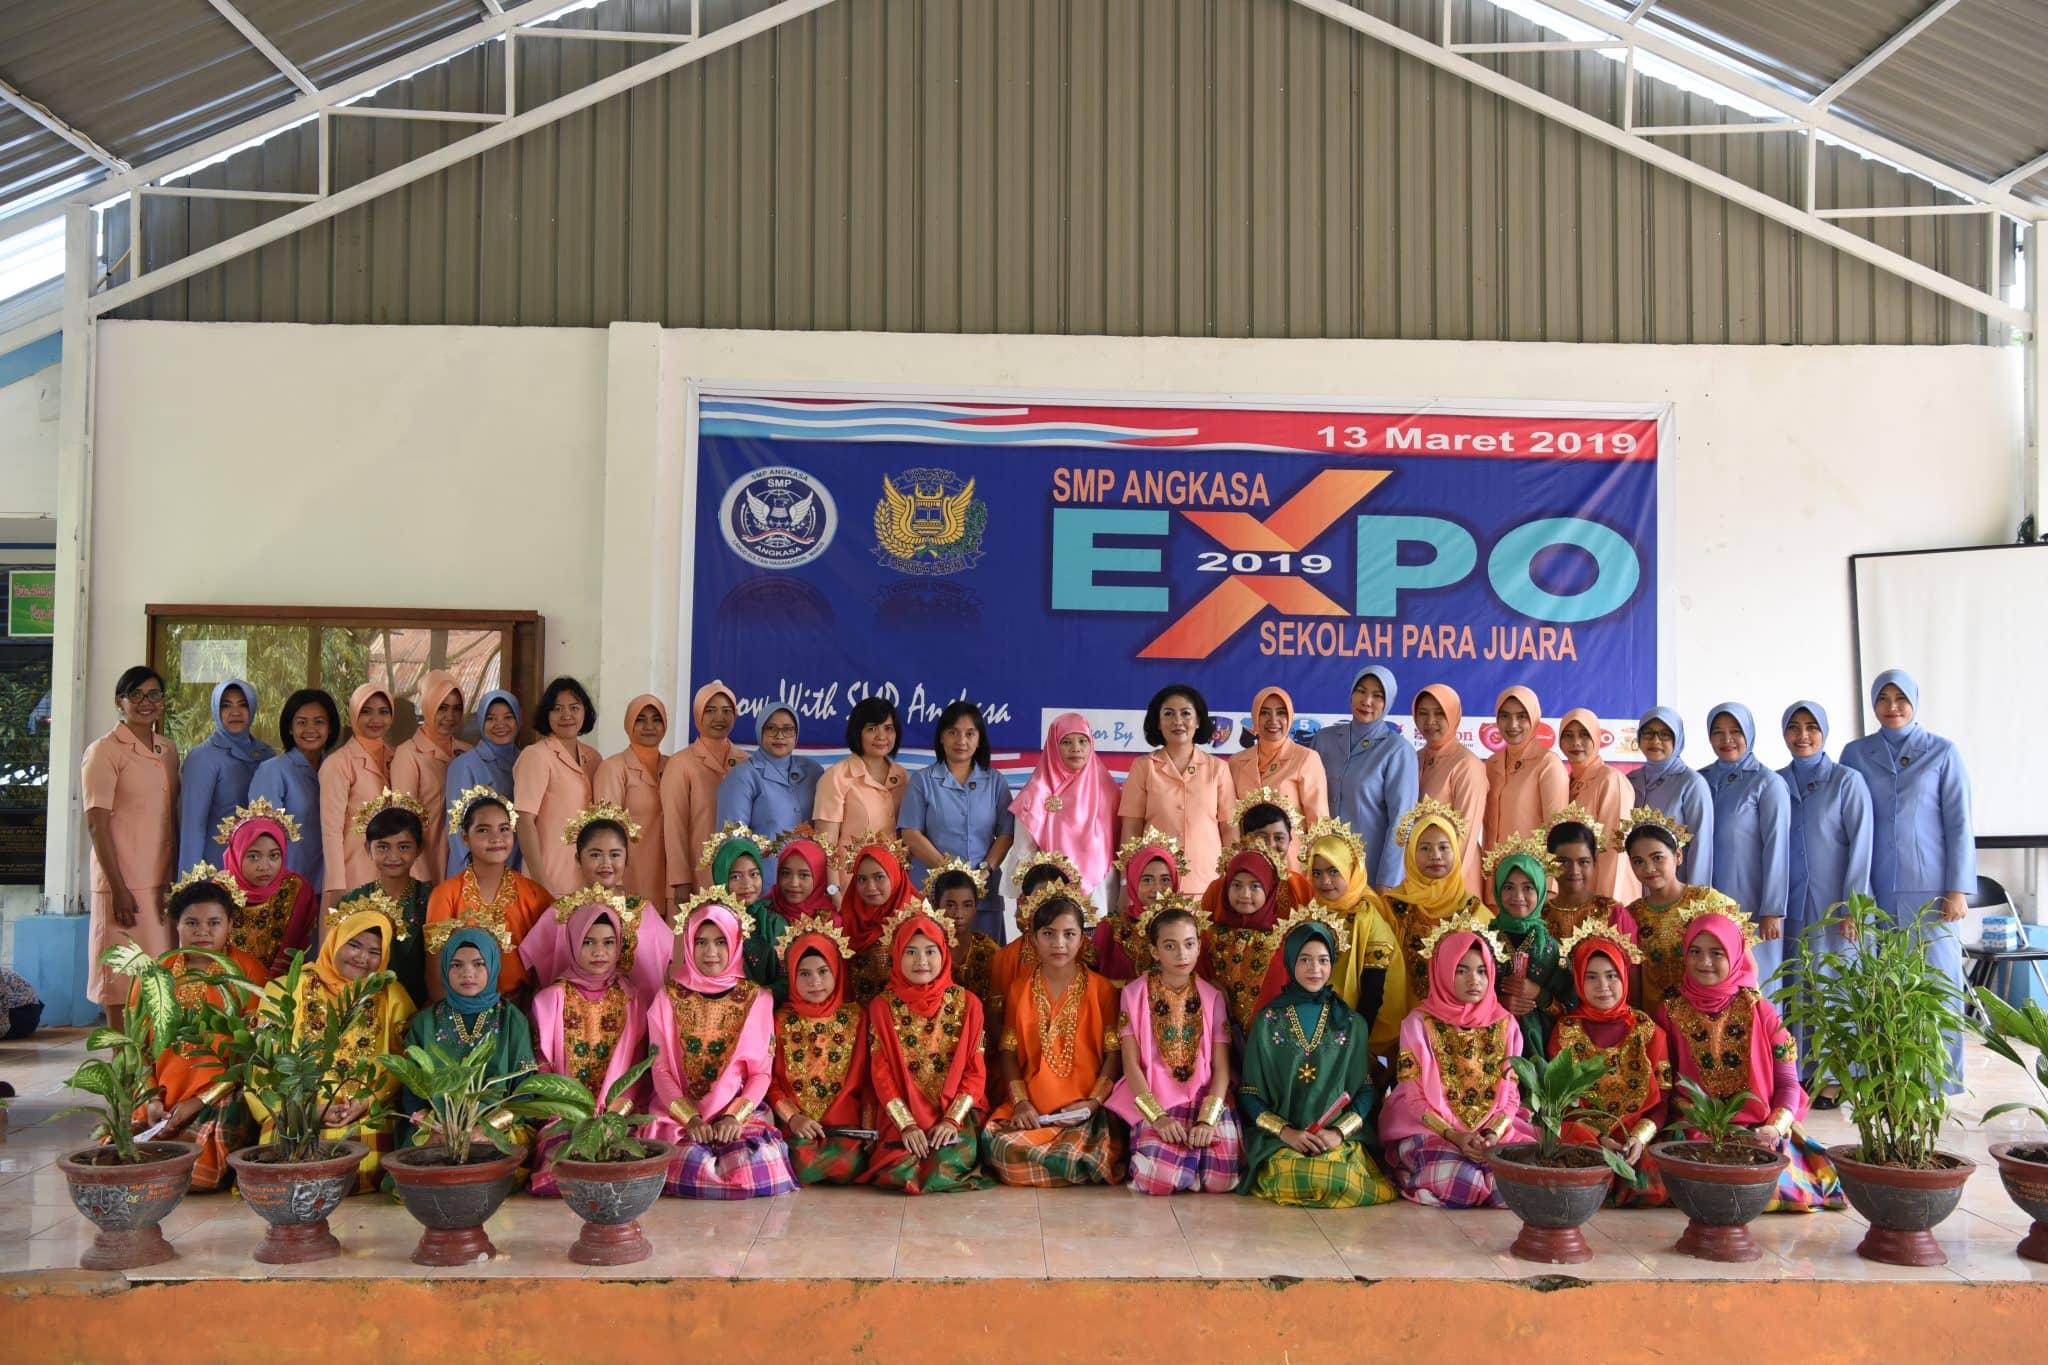 Yasarini Cabang Lanud Sultan Hasanuddin Gelar Angkasa Expo 2019